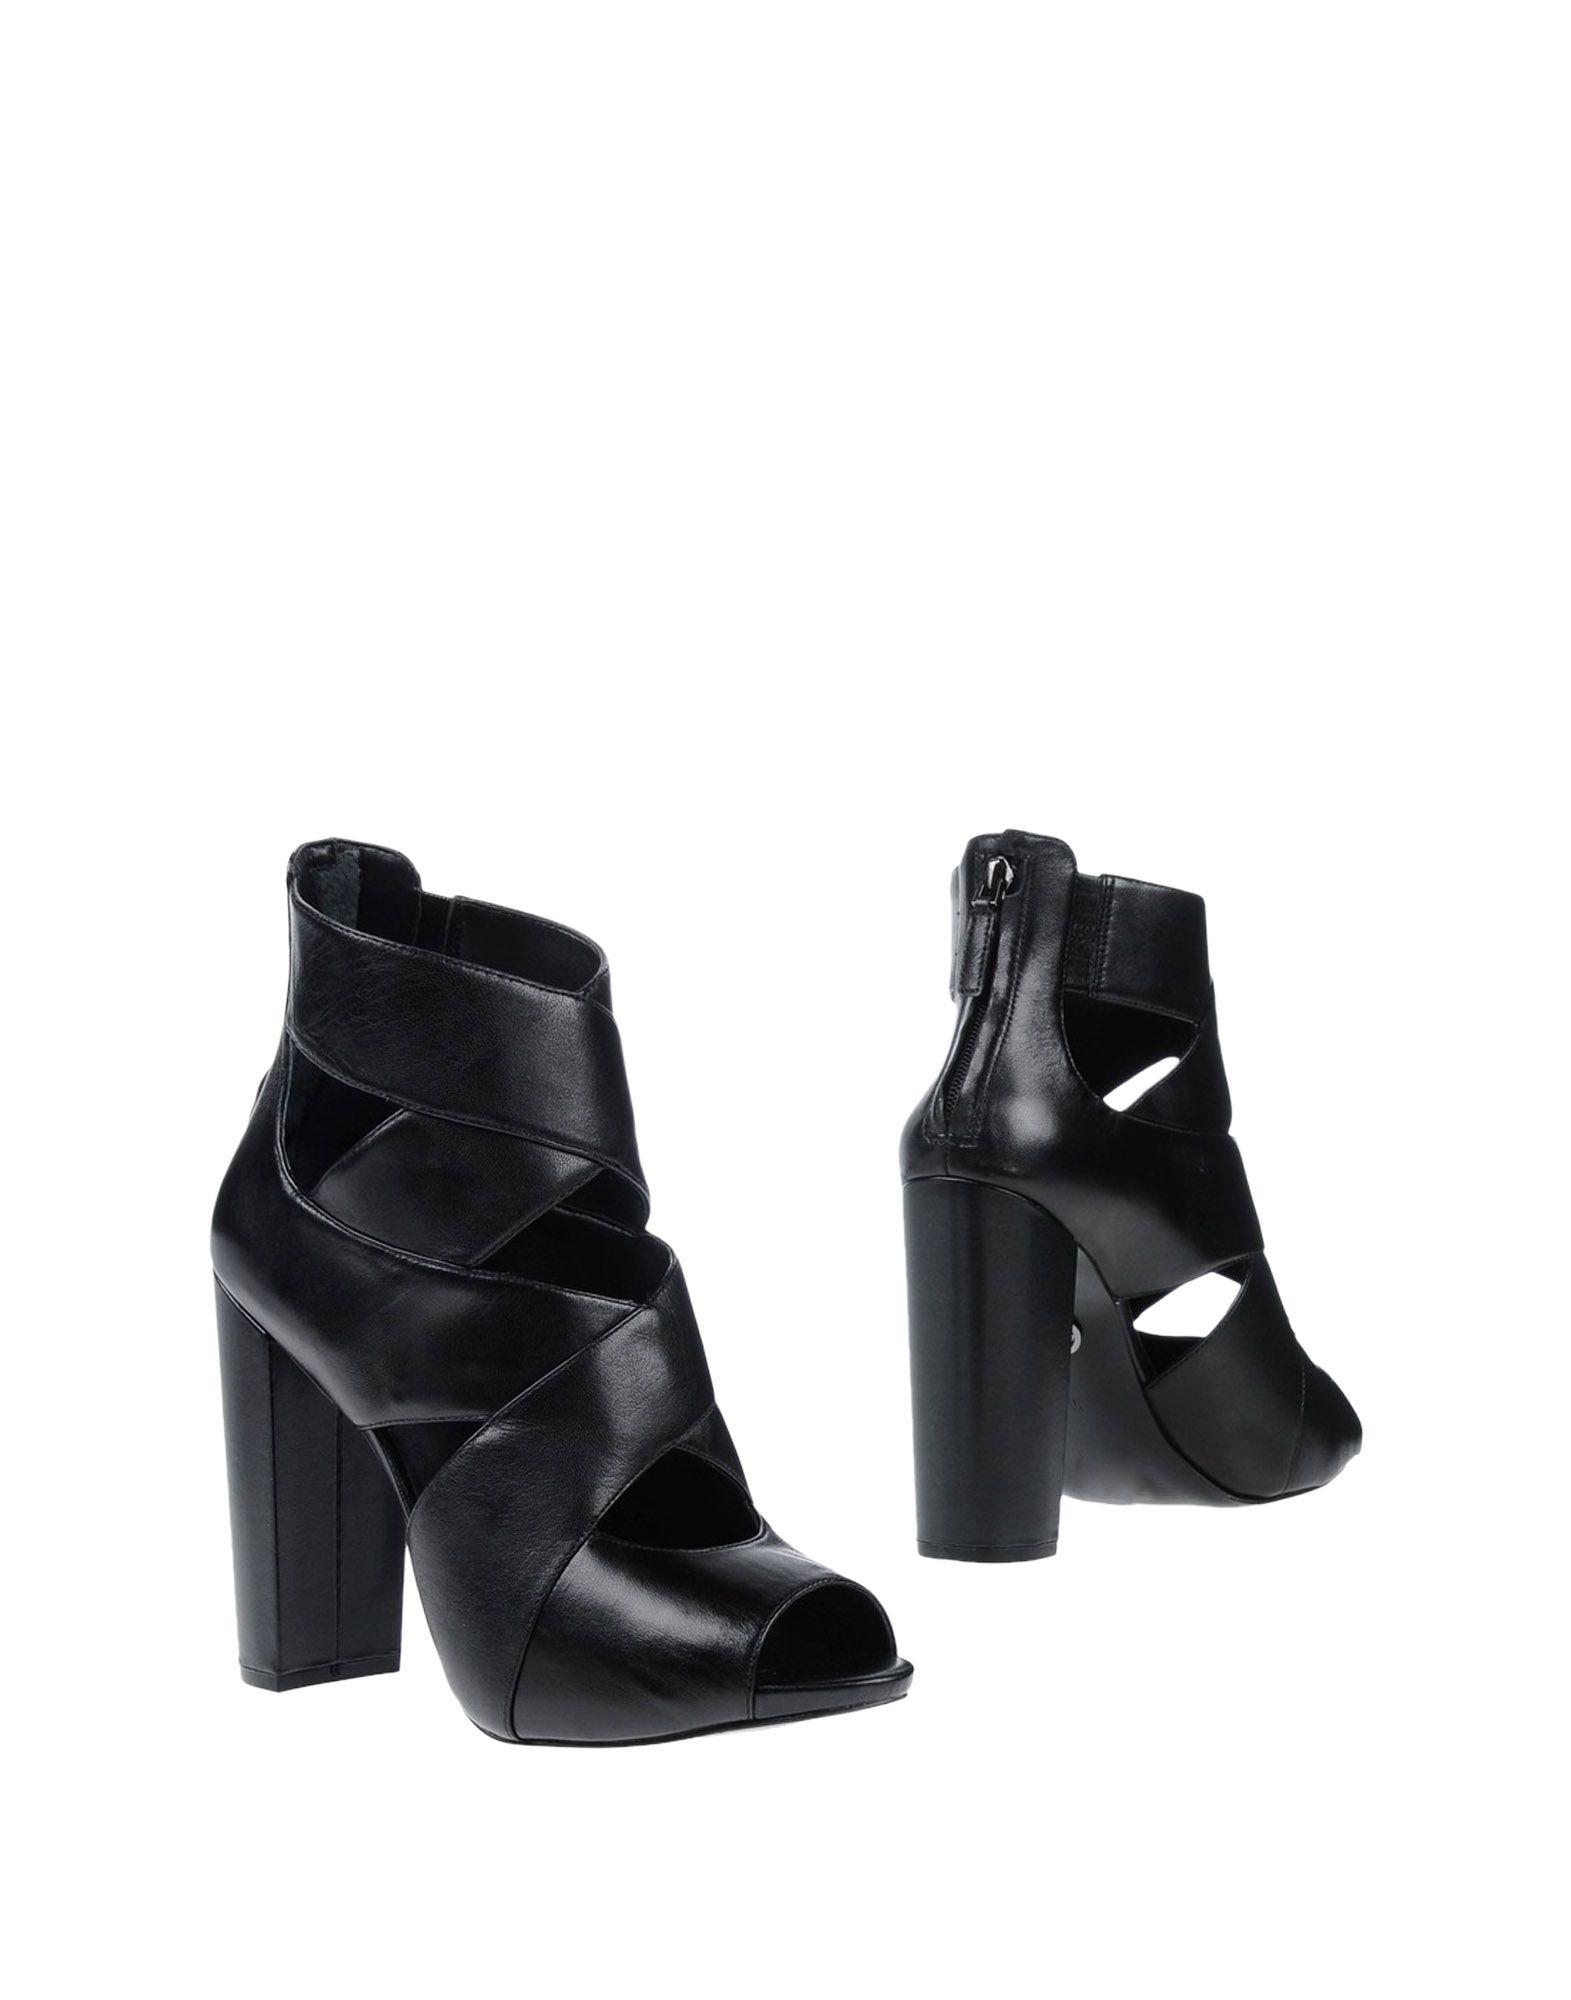 Stilvolle billige Schuhe Schuhe Schuhe Guess Stiefelette Damen  11335878NE 55a0d4